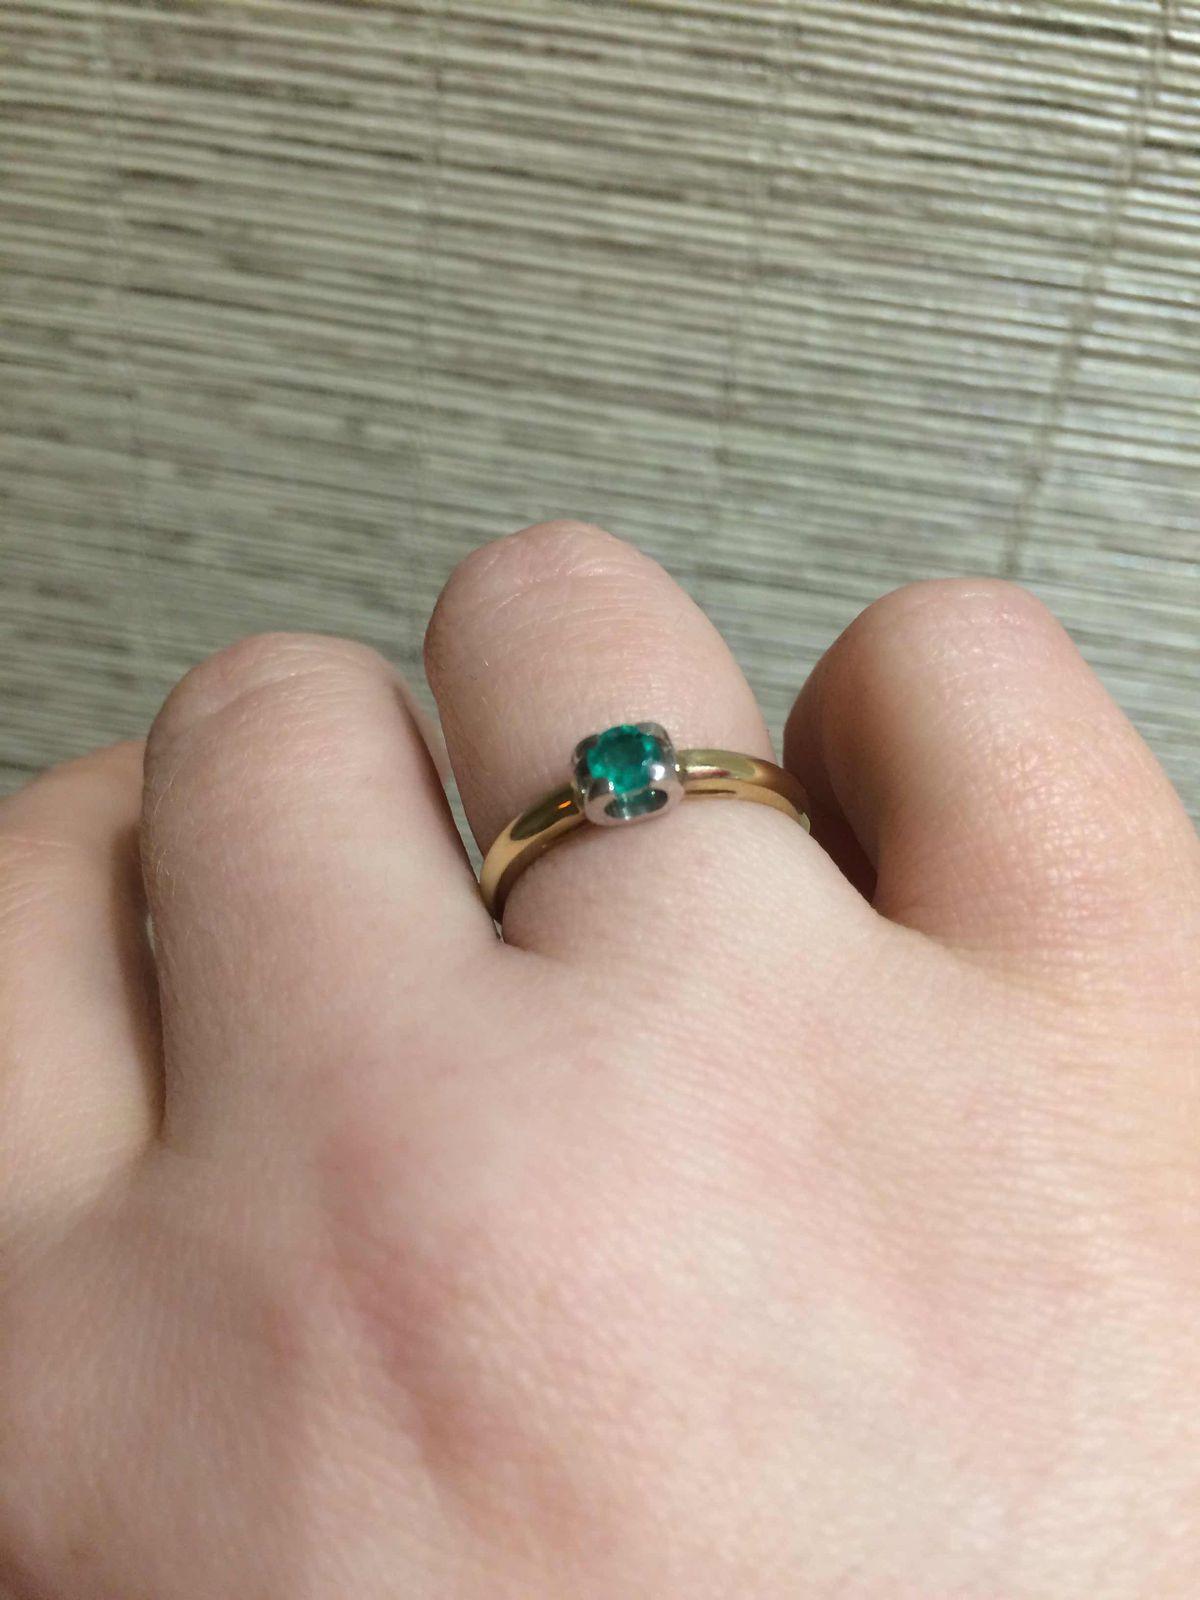 Особенное для меня кольцо